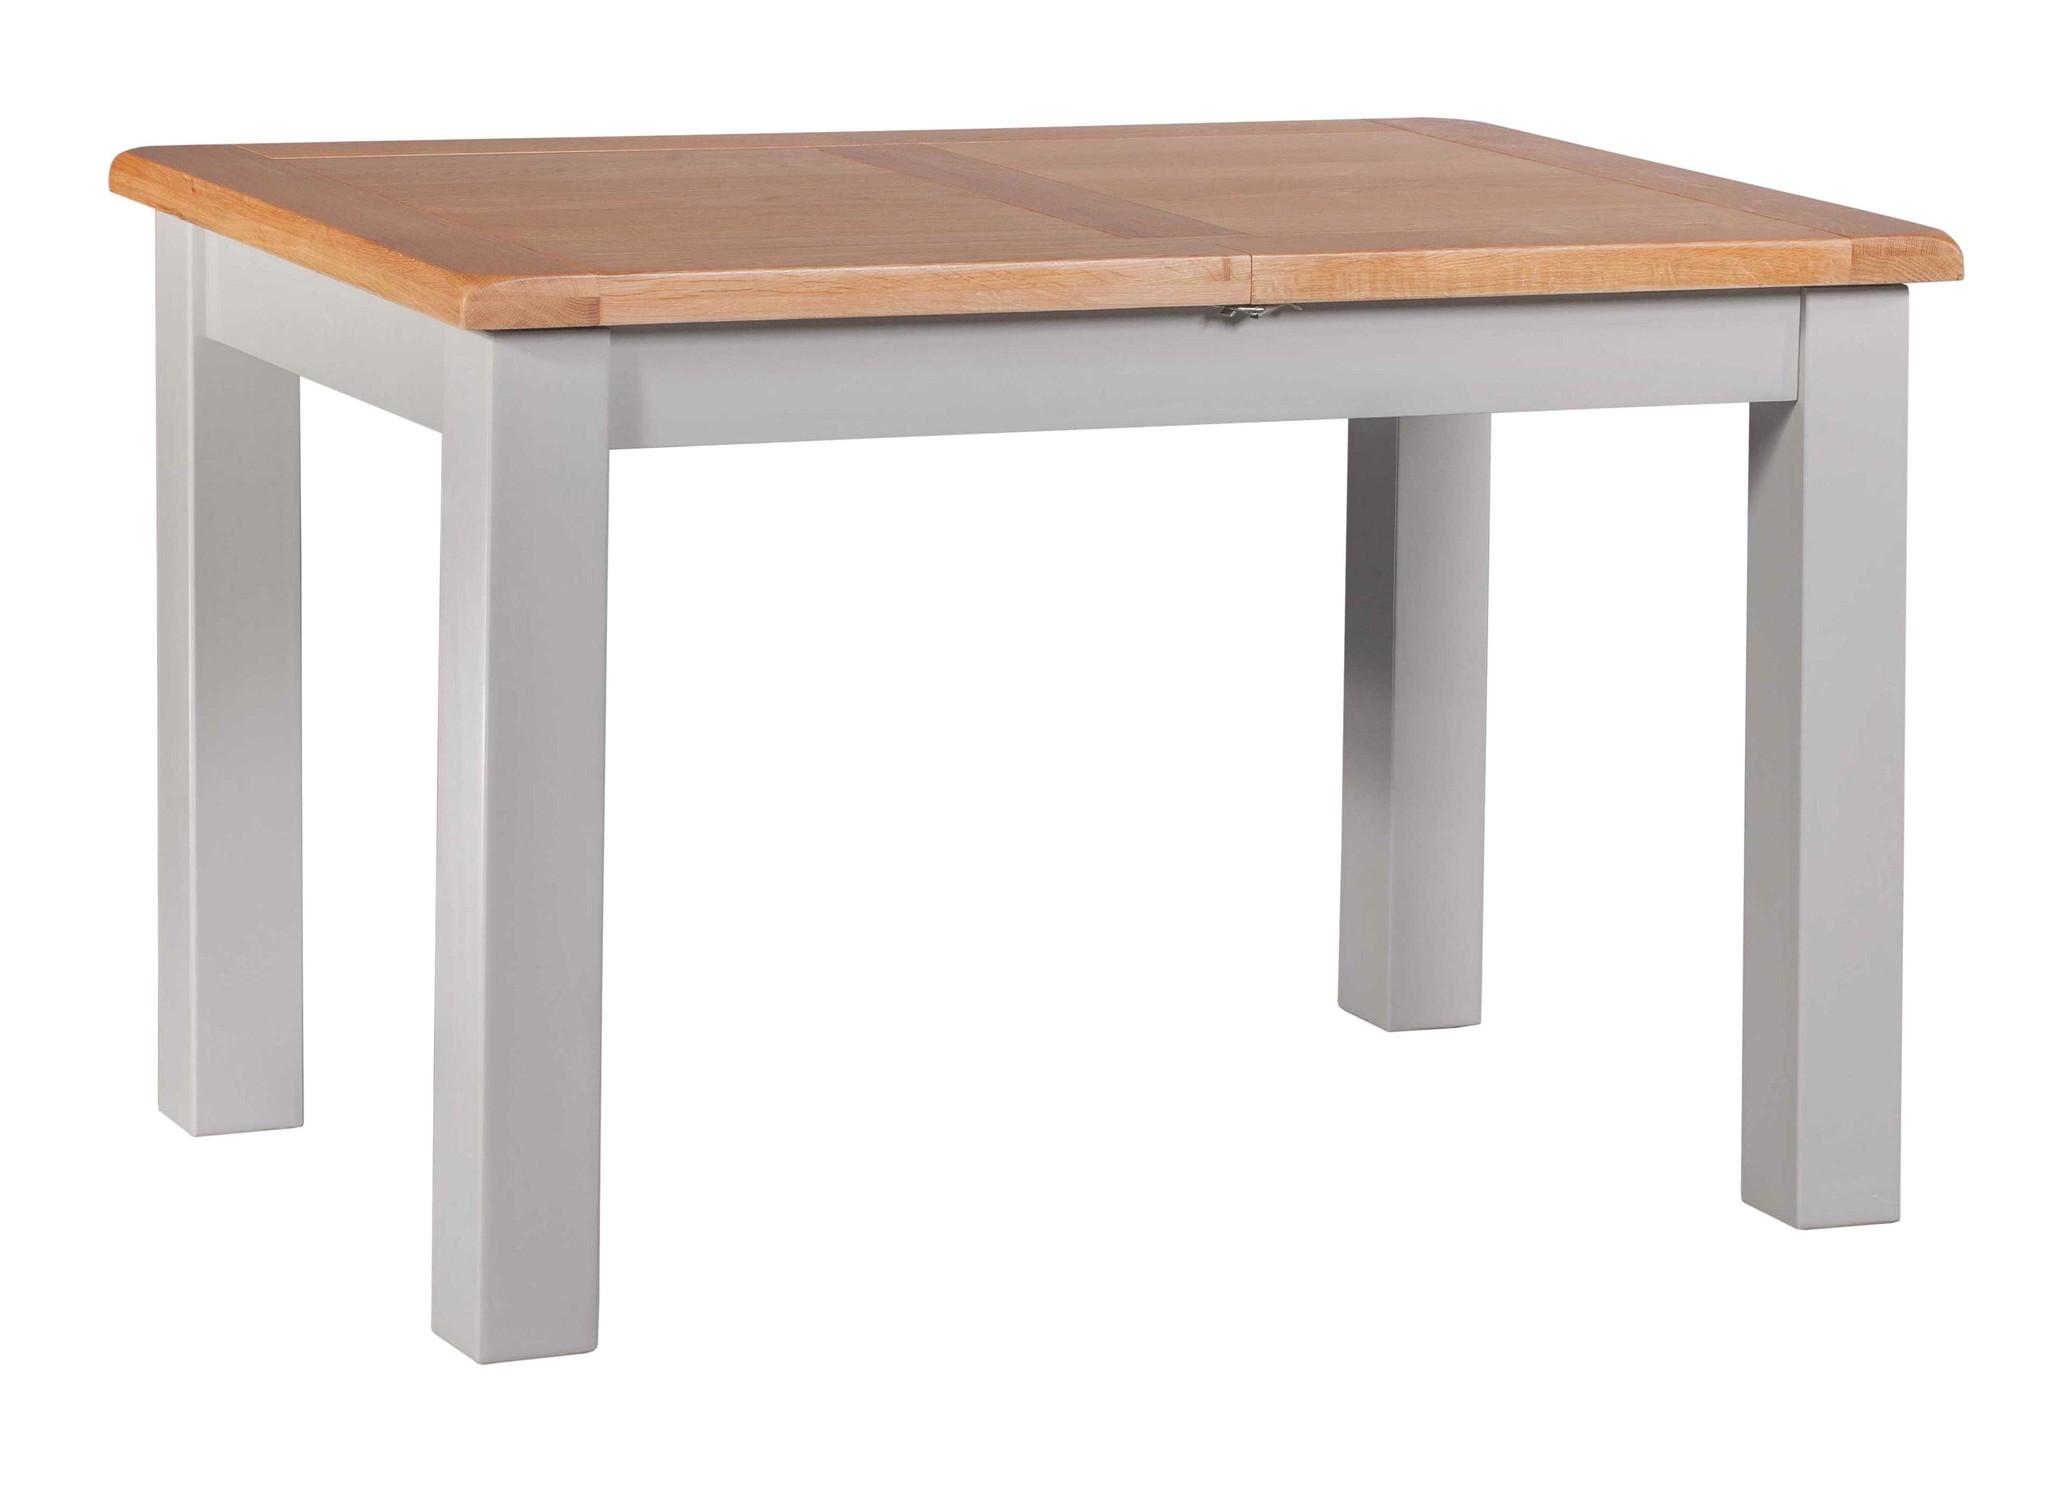 HomestyleGB Diamond Painted Small Extending Dining Table